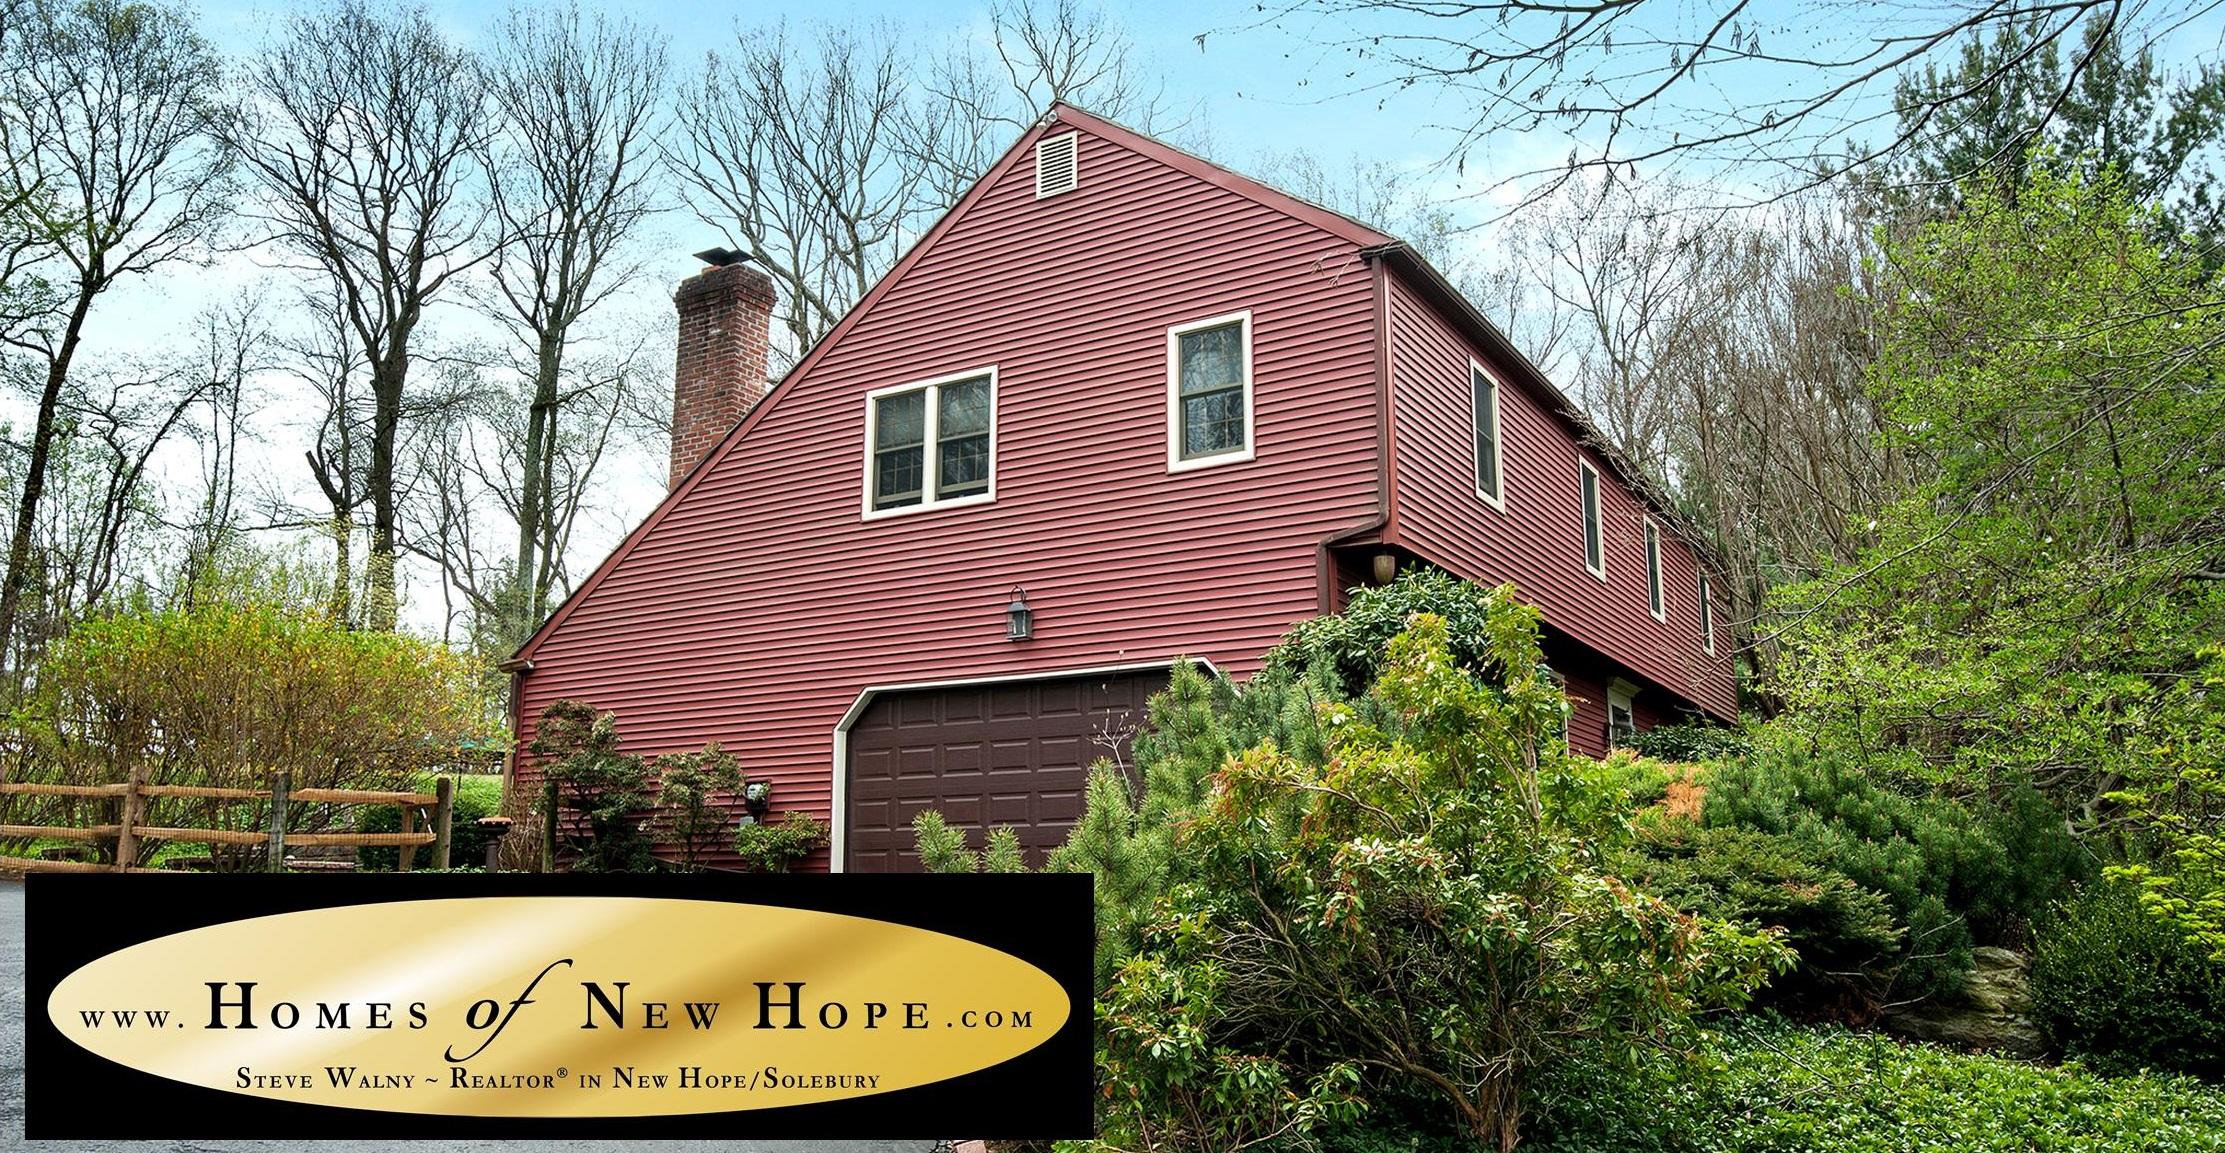 Homes of New Hope | Salt Box Bucks County | Solebury Home with Pool | Weidel Real Estate | Weidel Realtors